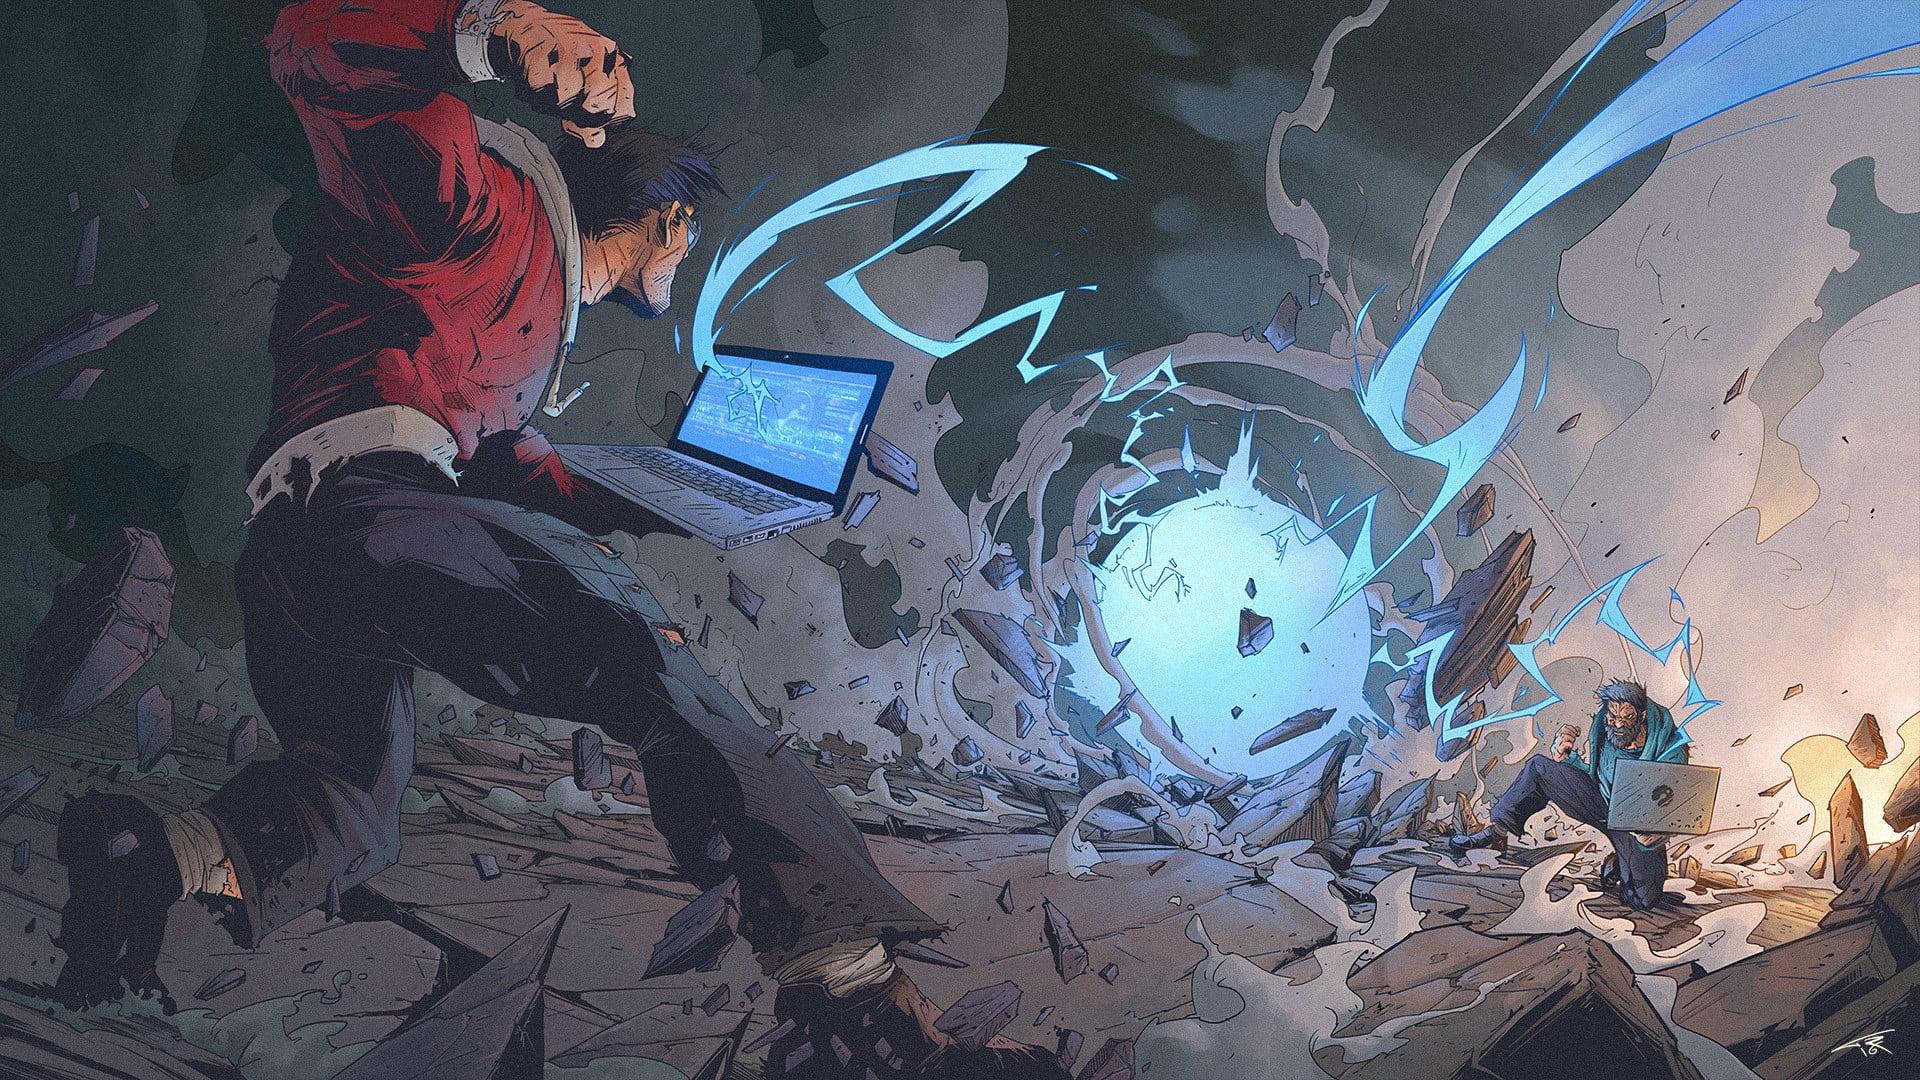 Laptop Anime Wallpaper Hd 1920x1080 Wallpaper Teahub Io